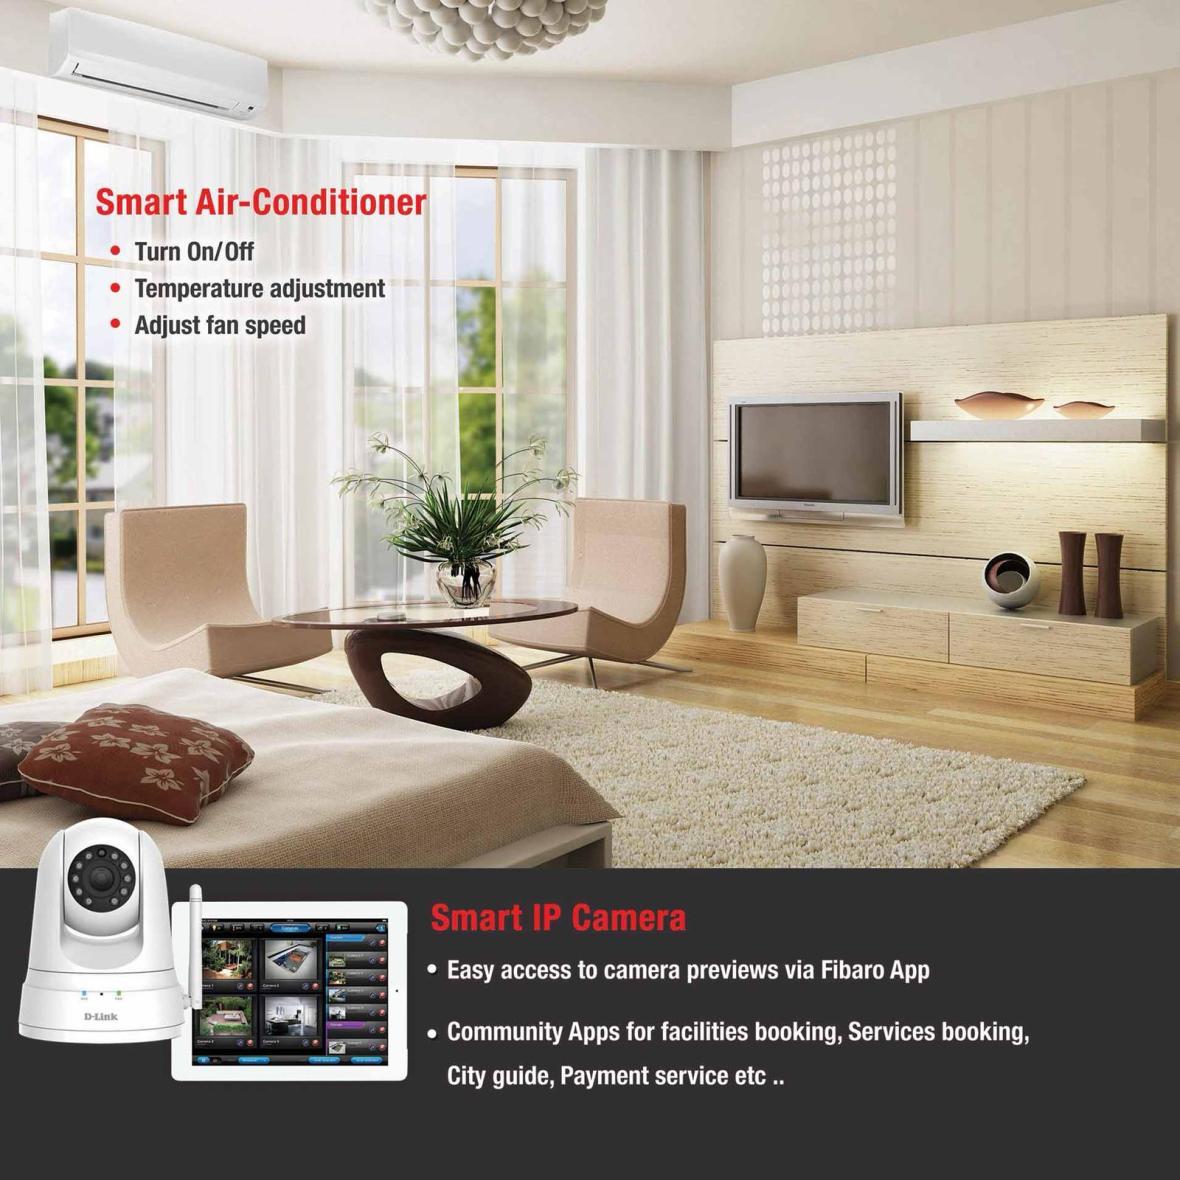 Belgravia Green Smart Aircon & IP Camera, developer sales, sales team, clara heng